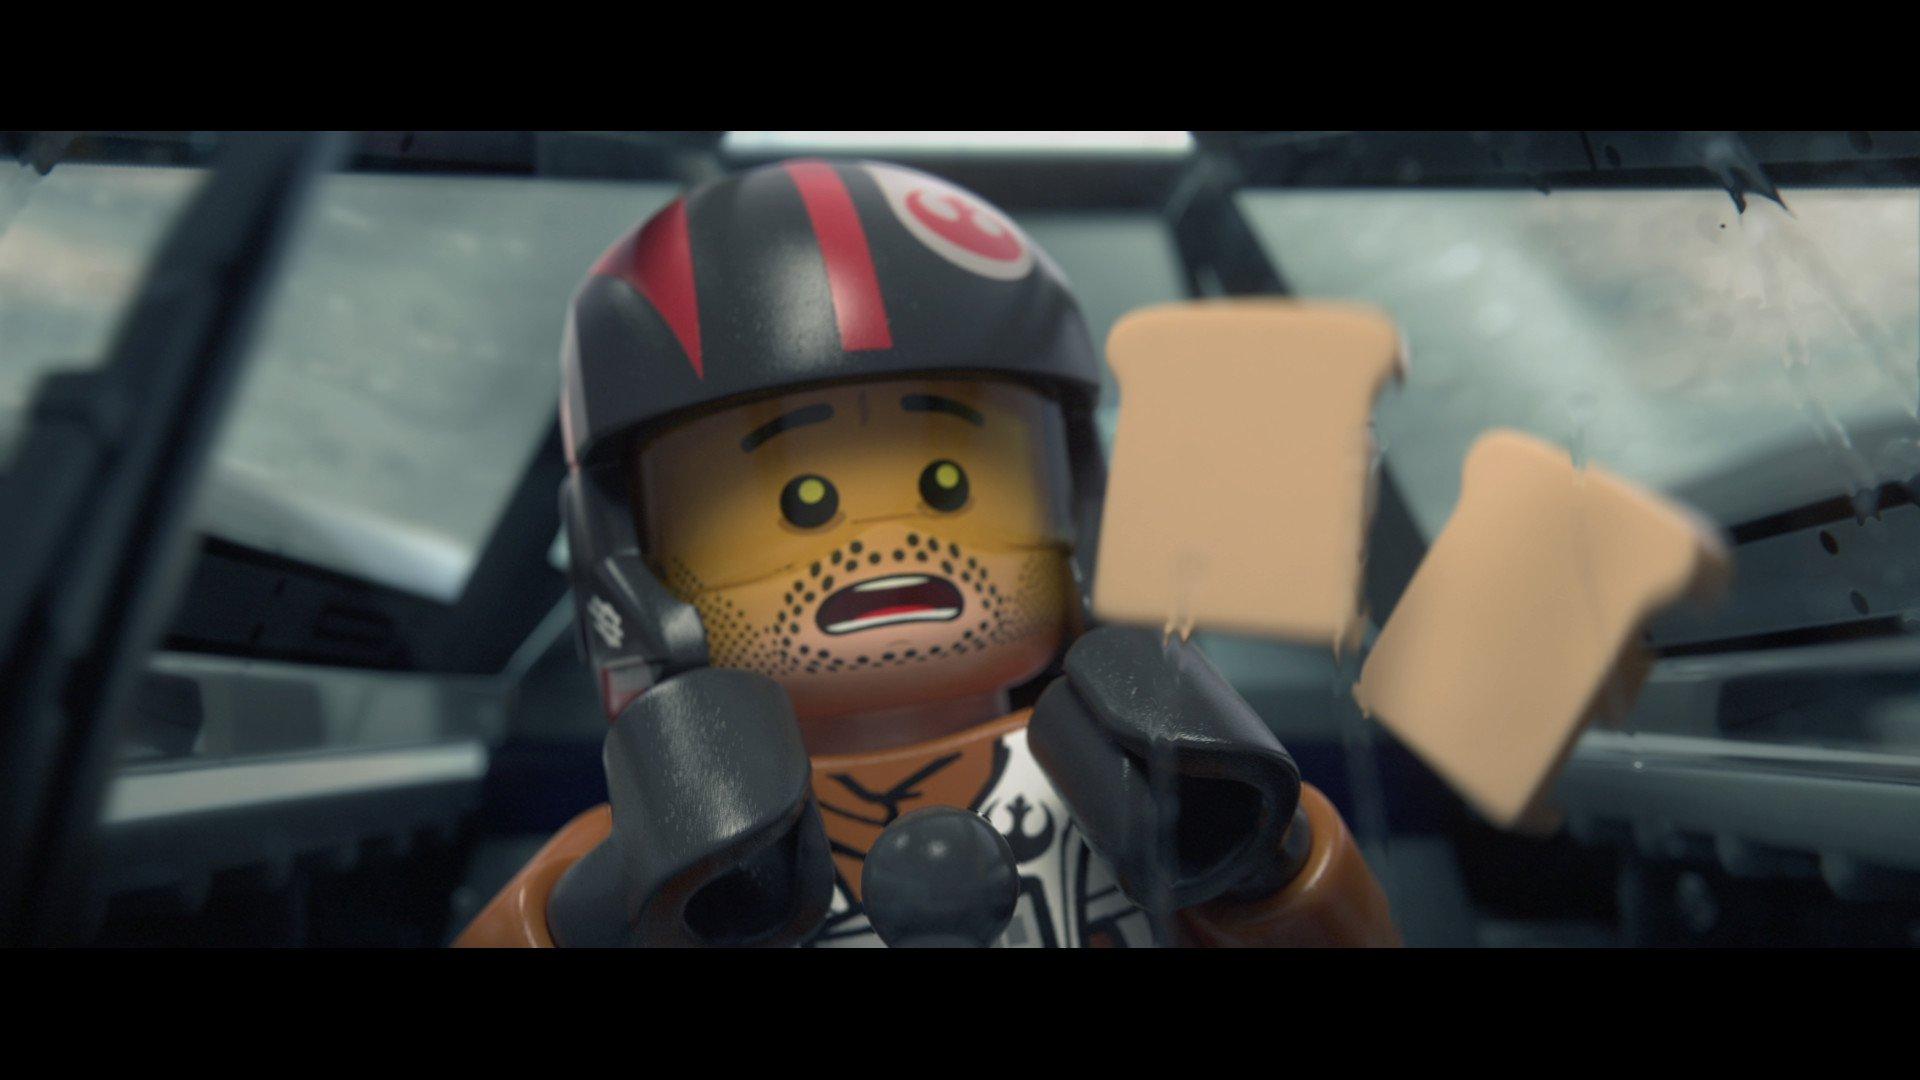 LEGO Star Wars The Force Awakens 7